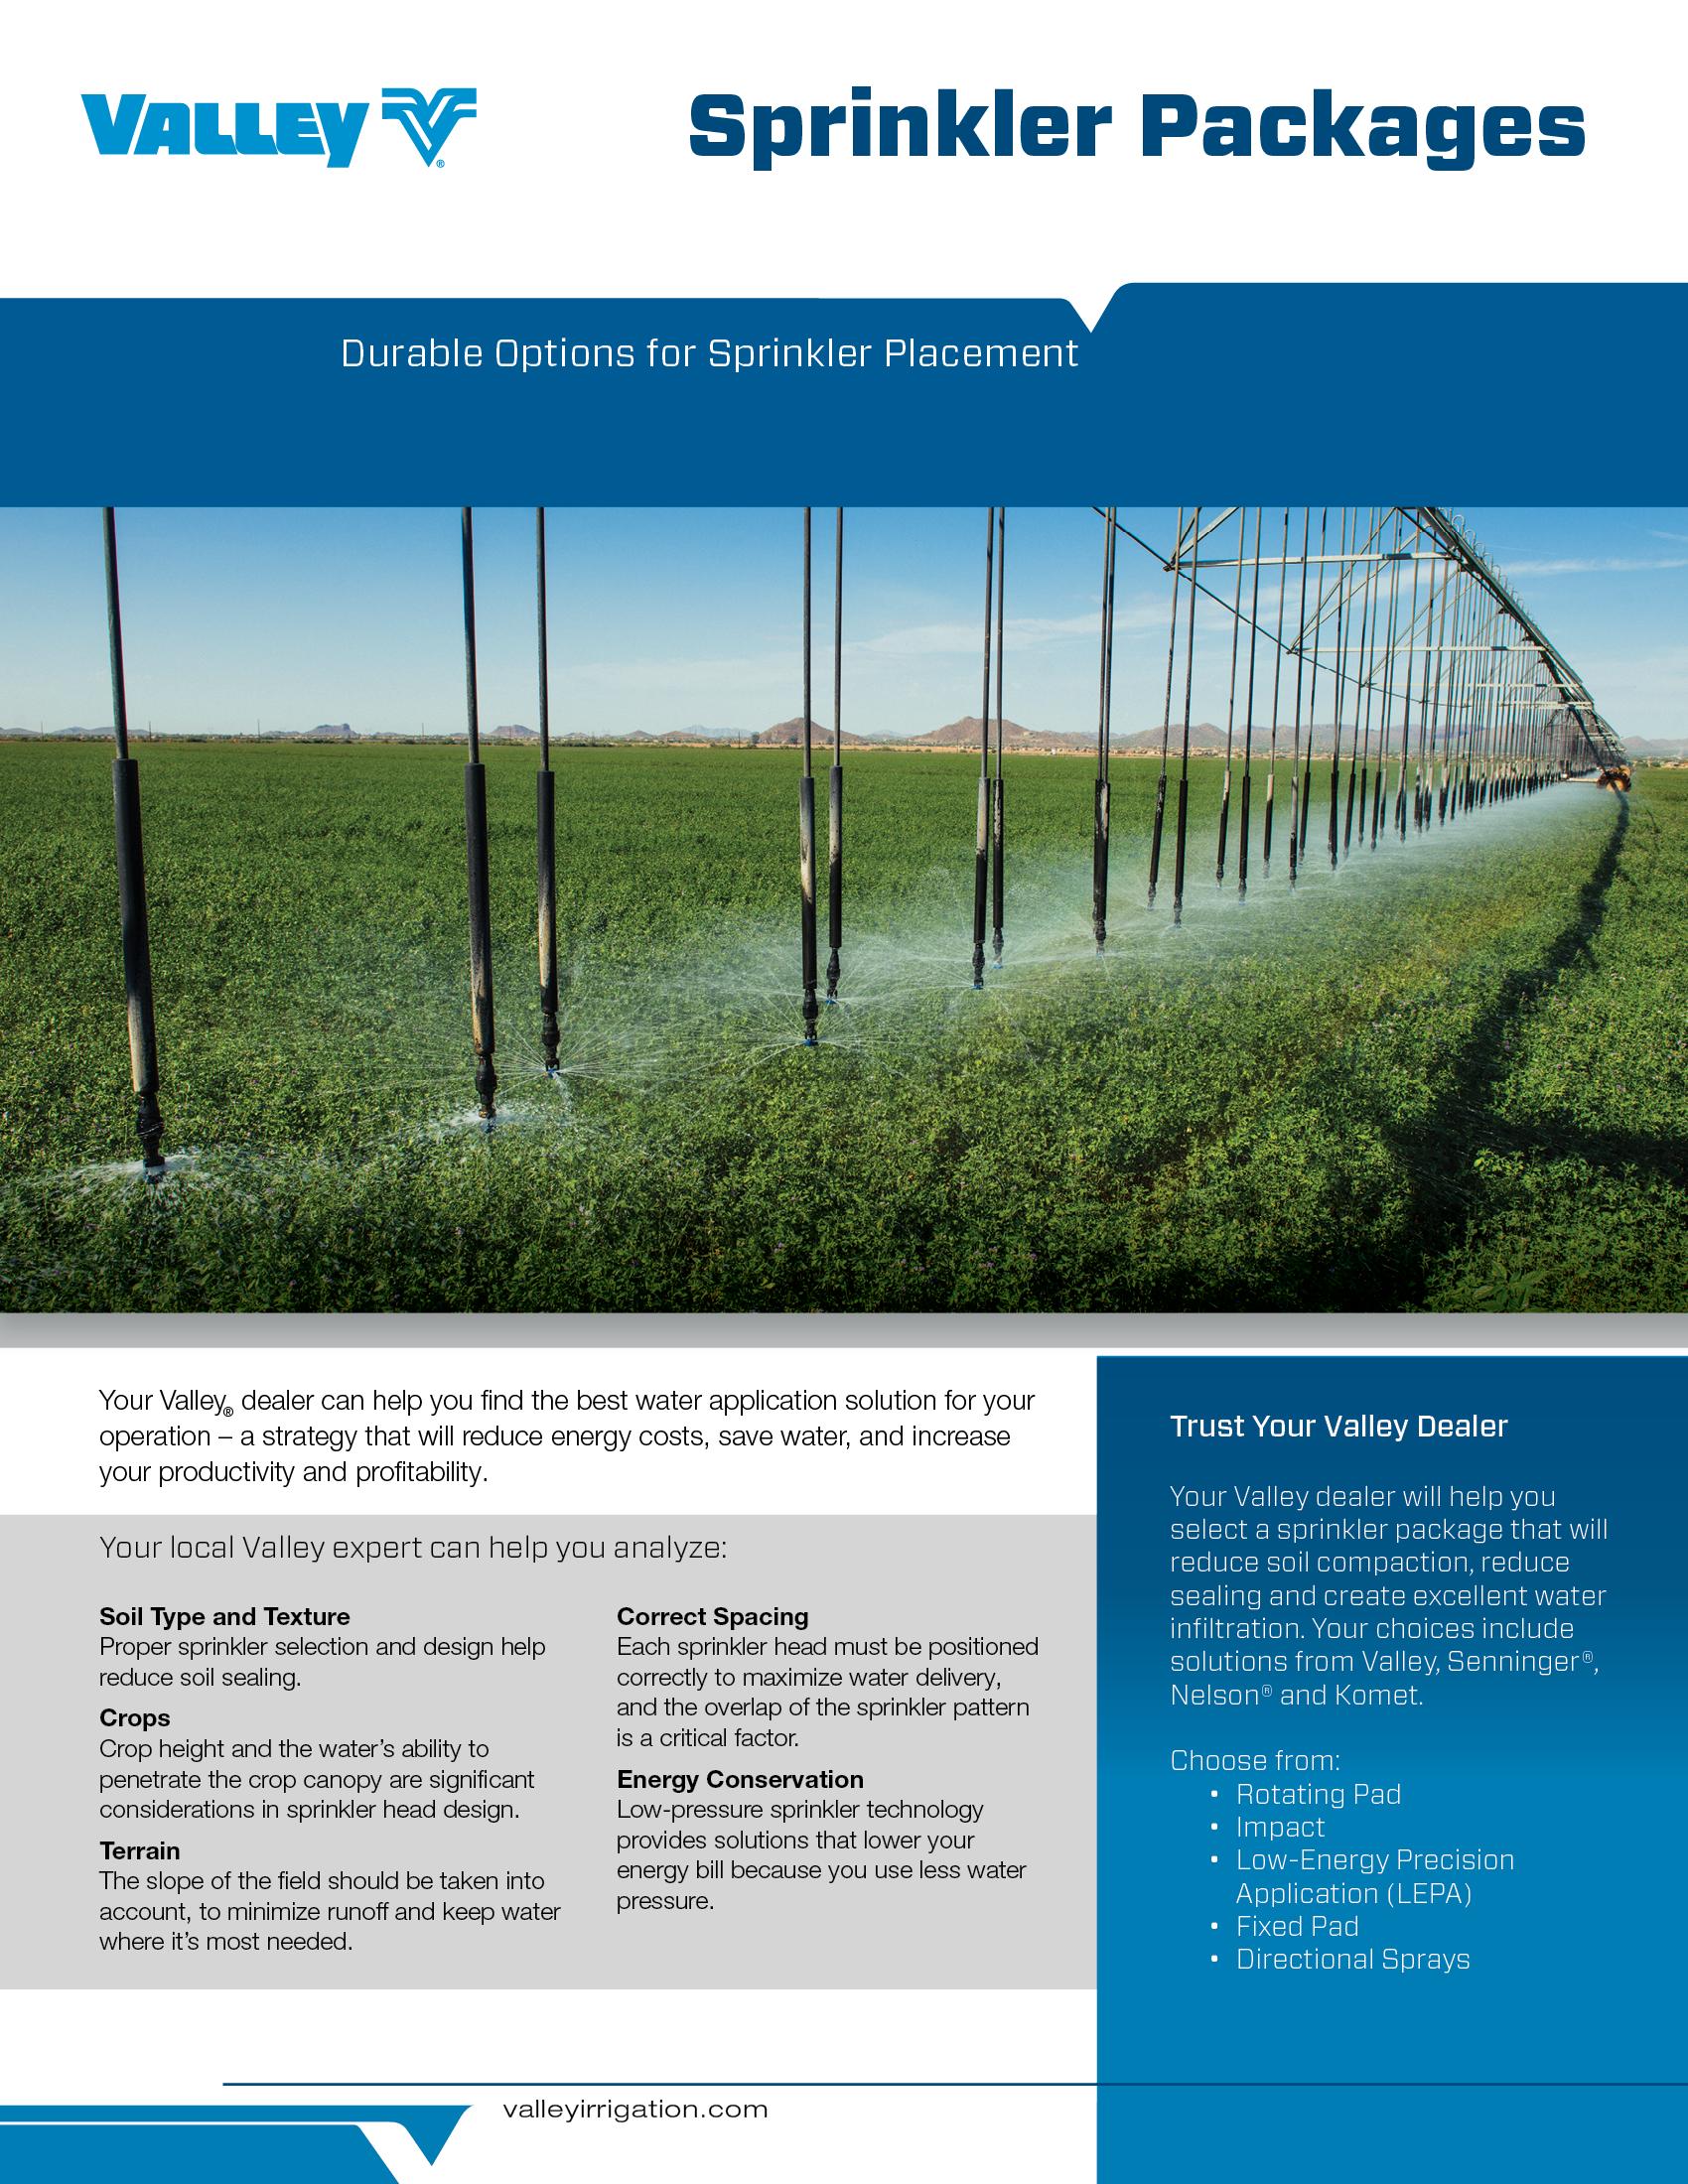 Nelson Irrigation - Center Pivot Sprinklers | Valley